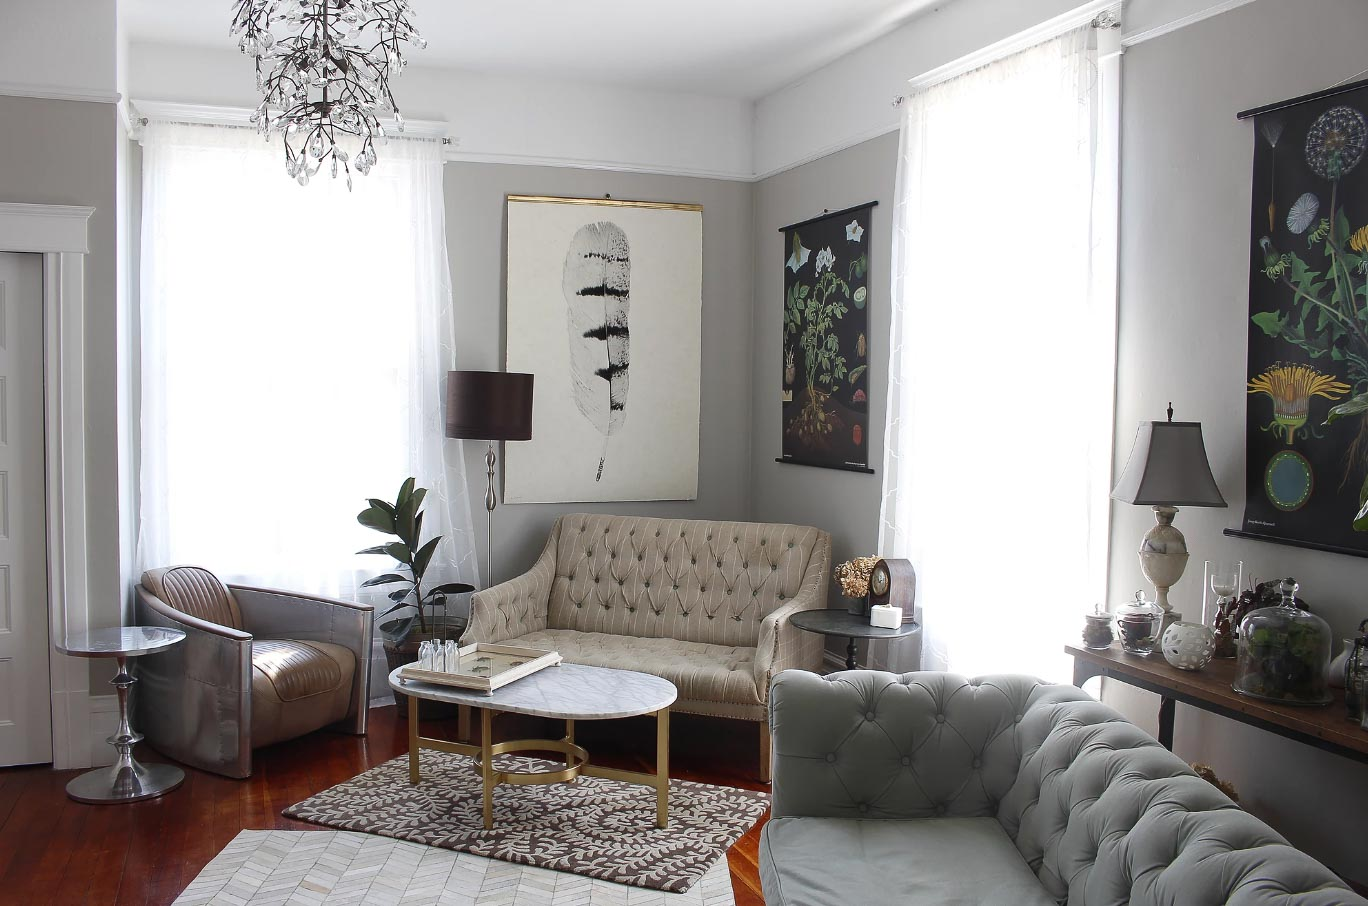 Petaluma-Place-natural-light-photography-studio-lifestyle-photo-ideas-indoor-photoshoot-location-4.jpg